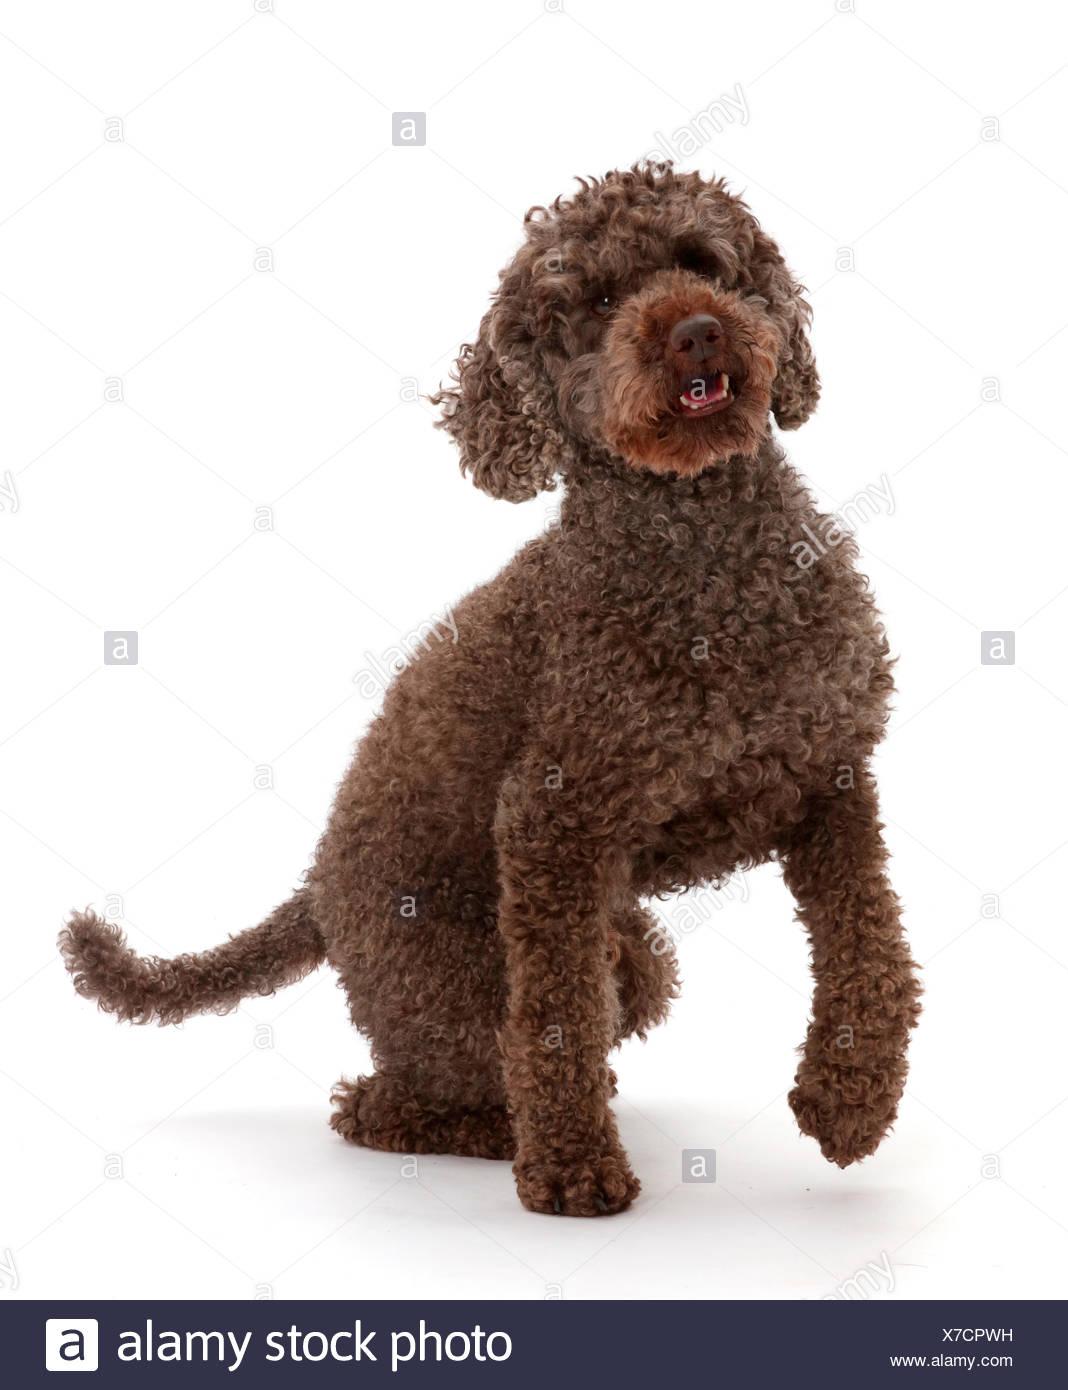 Playful Poodle. - Stock Image